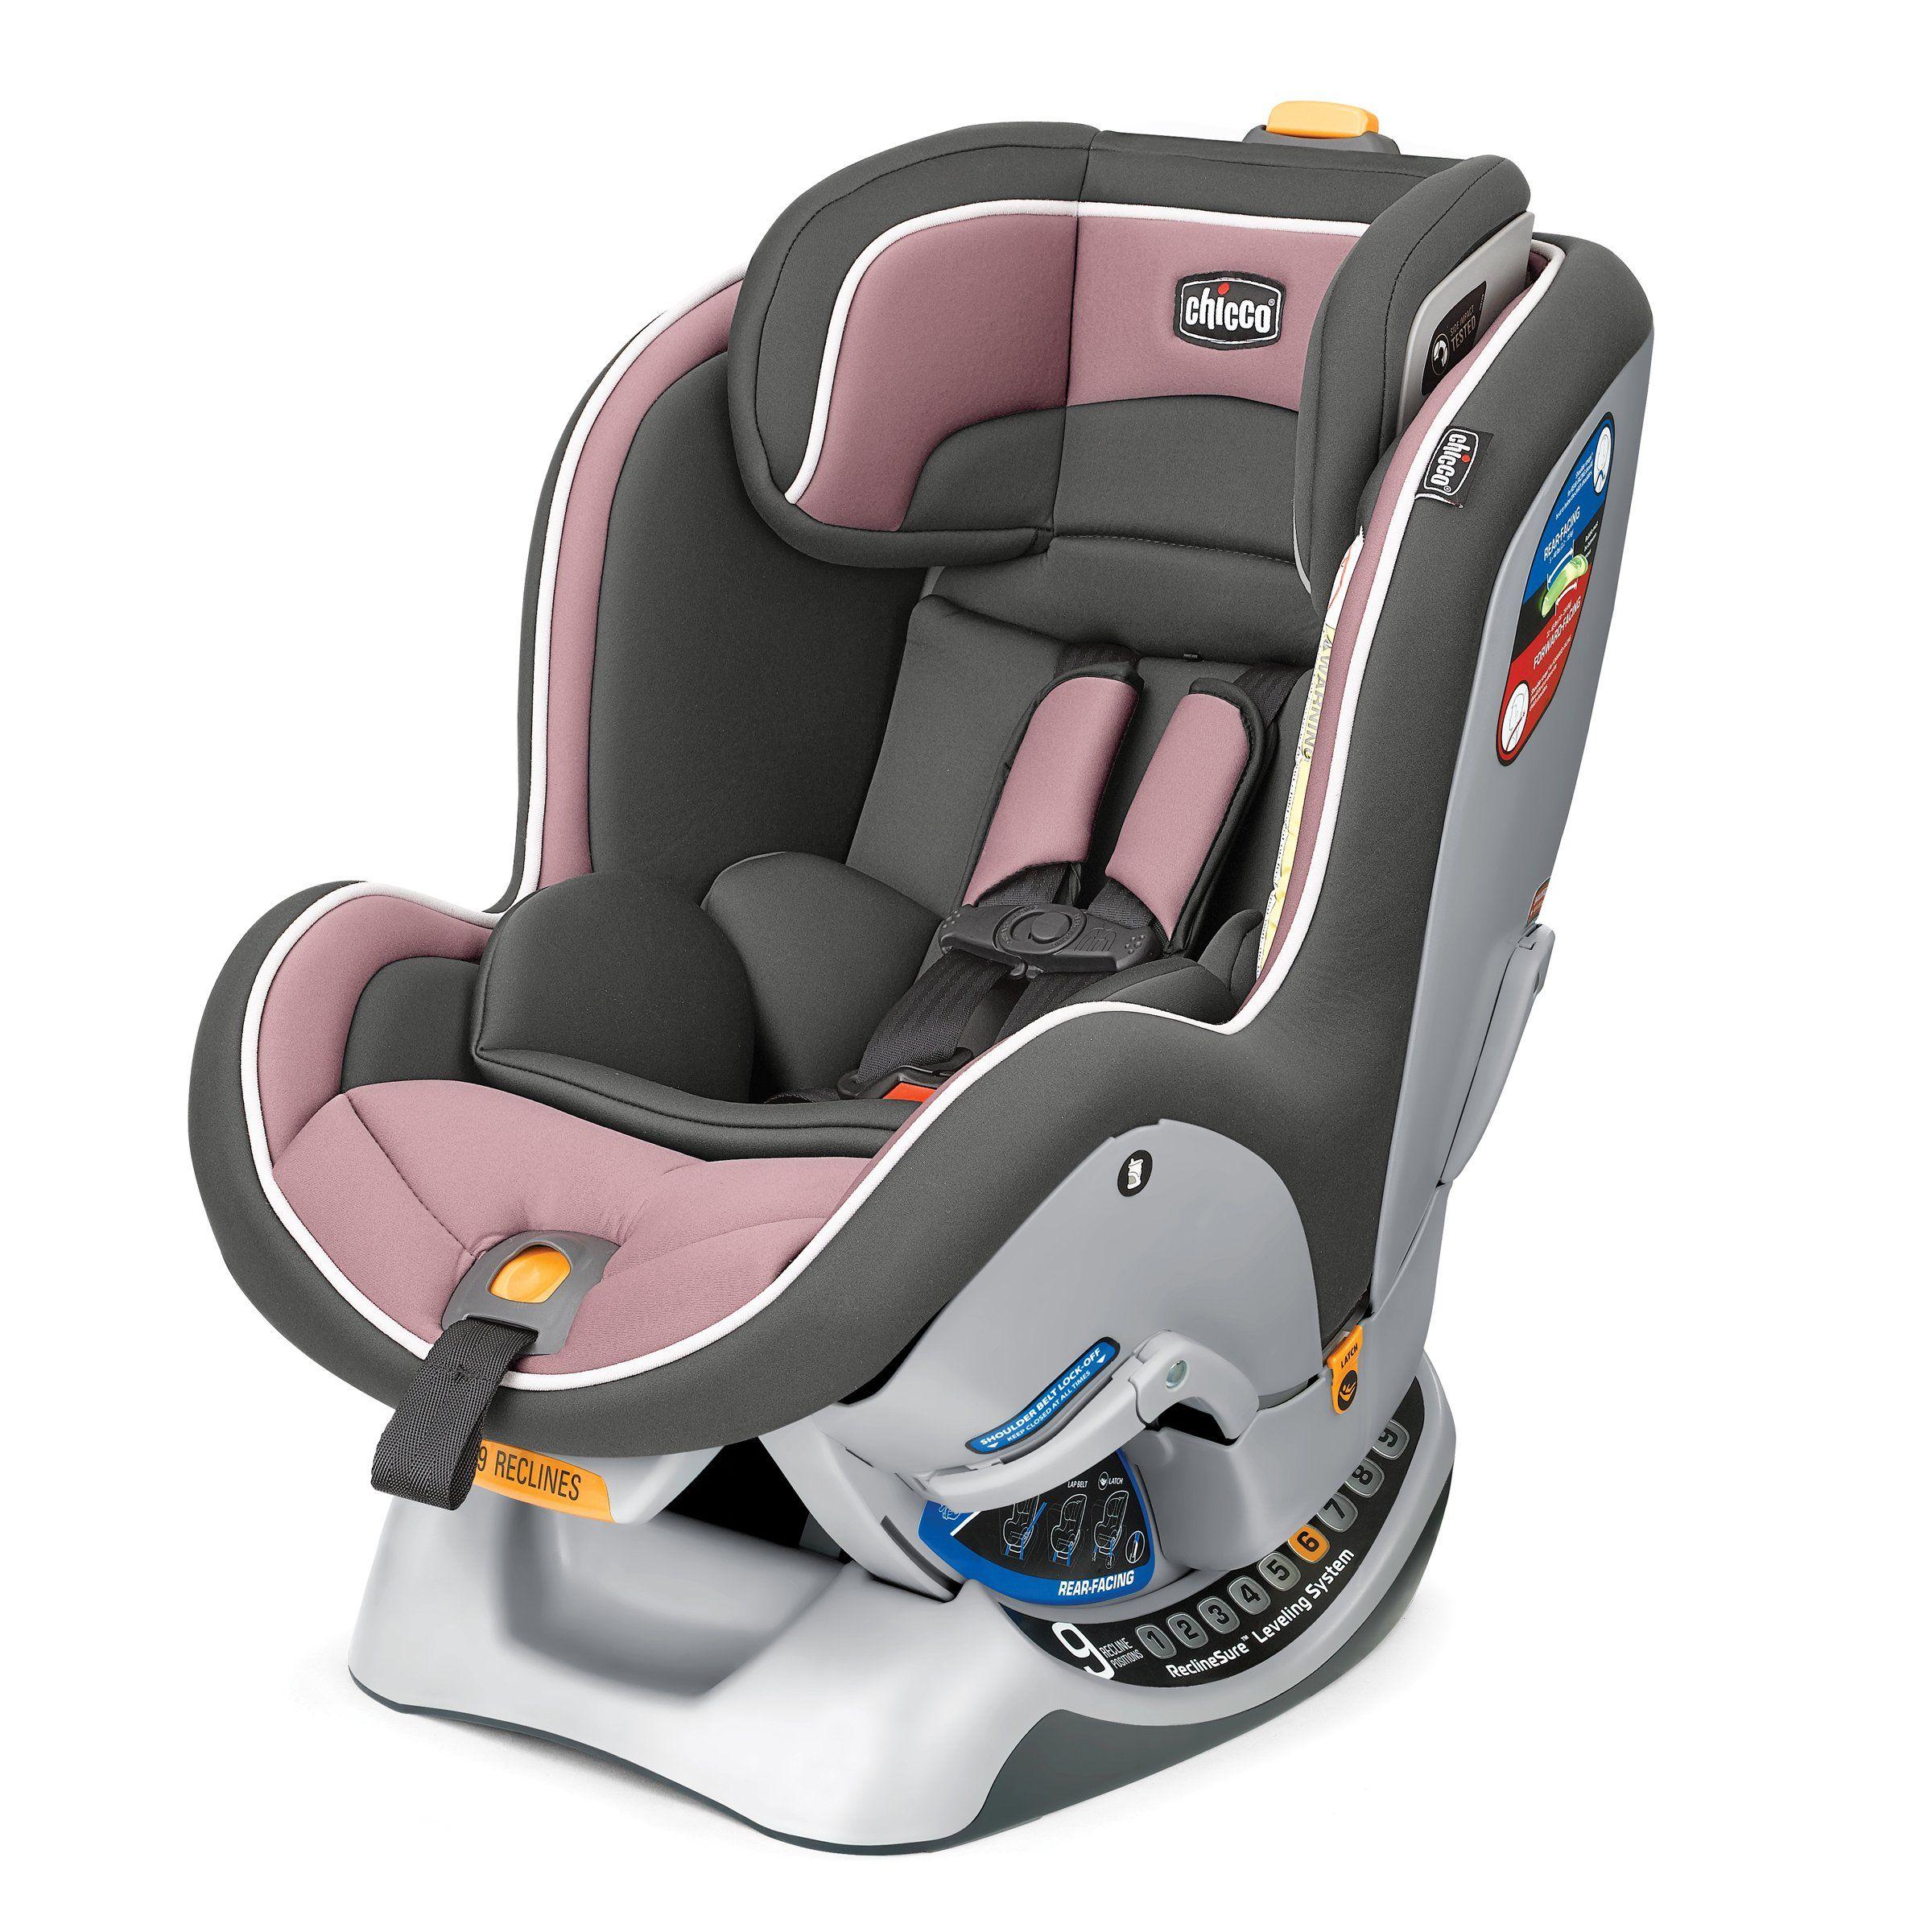 Amazon Com Chicco Nextfit Convertible Car Seat Mystique Convertible Child Safety Car Seats Baby Baby Car Seats Car Seats